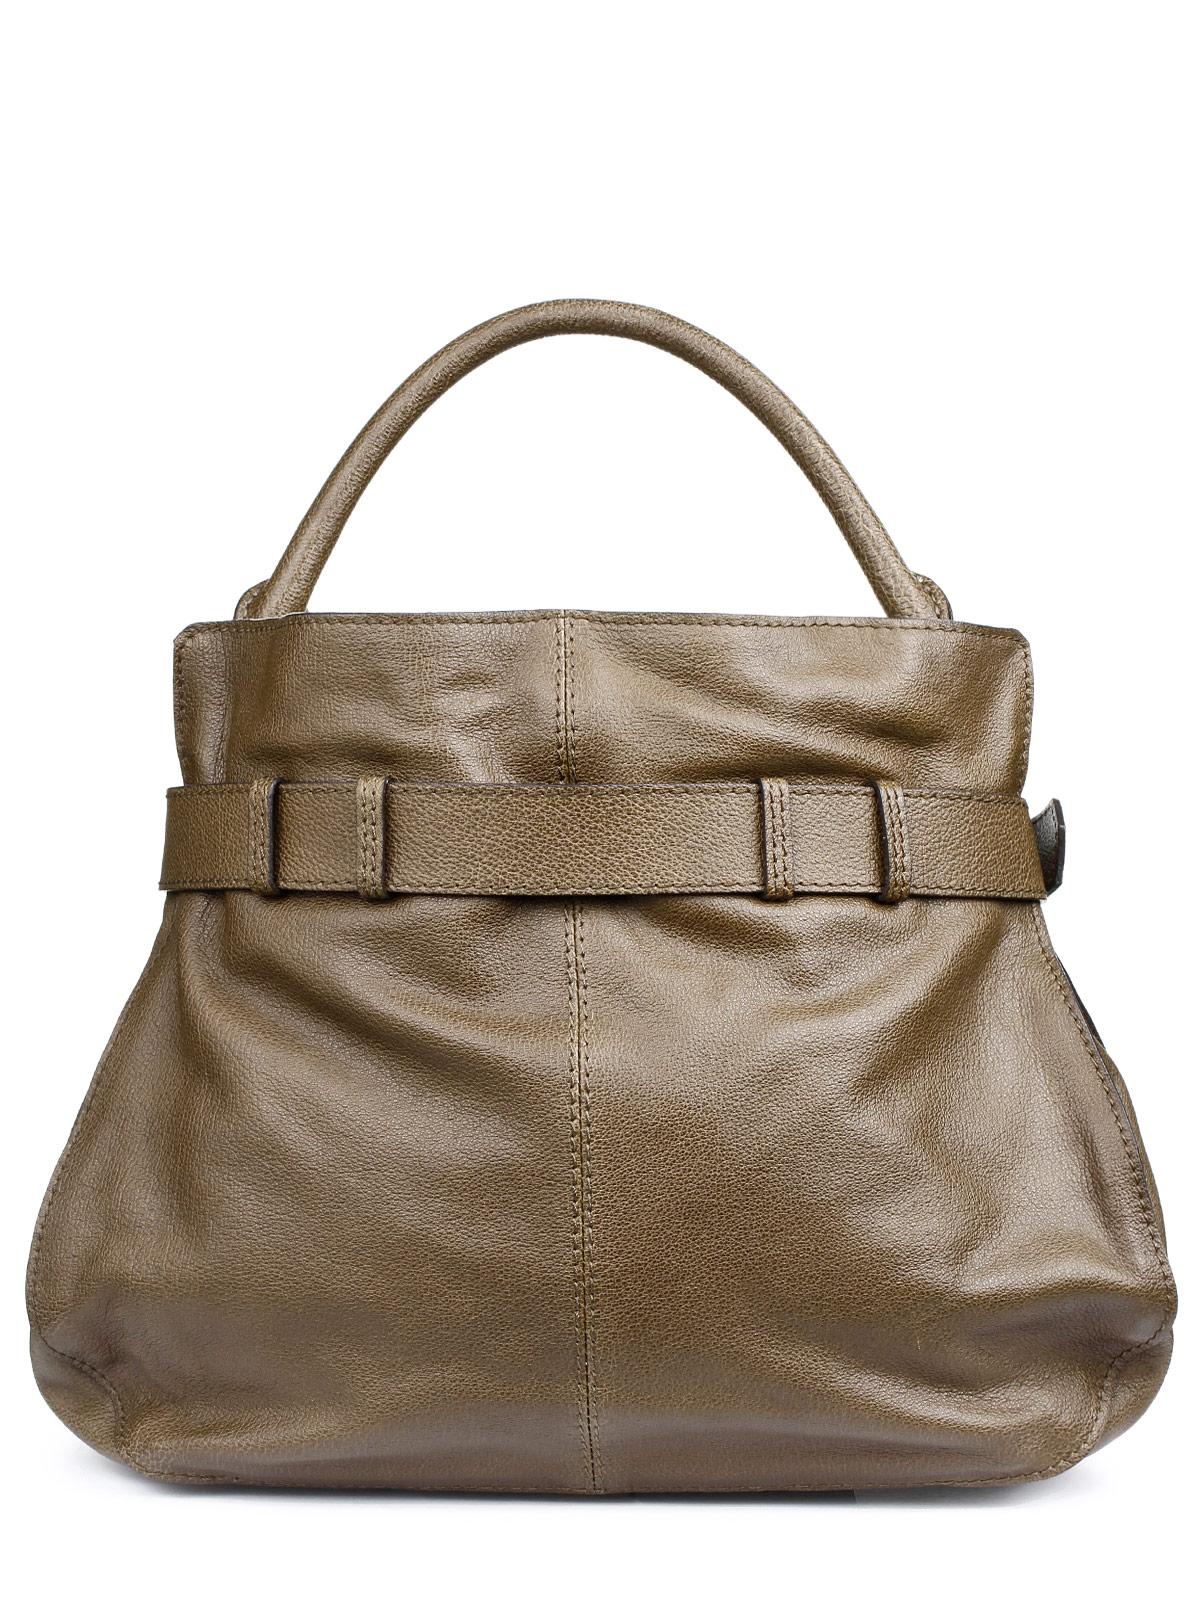 burberry handbags outlet online  burberry bag f-50-ta-23384